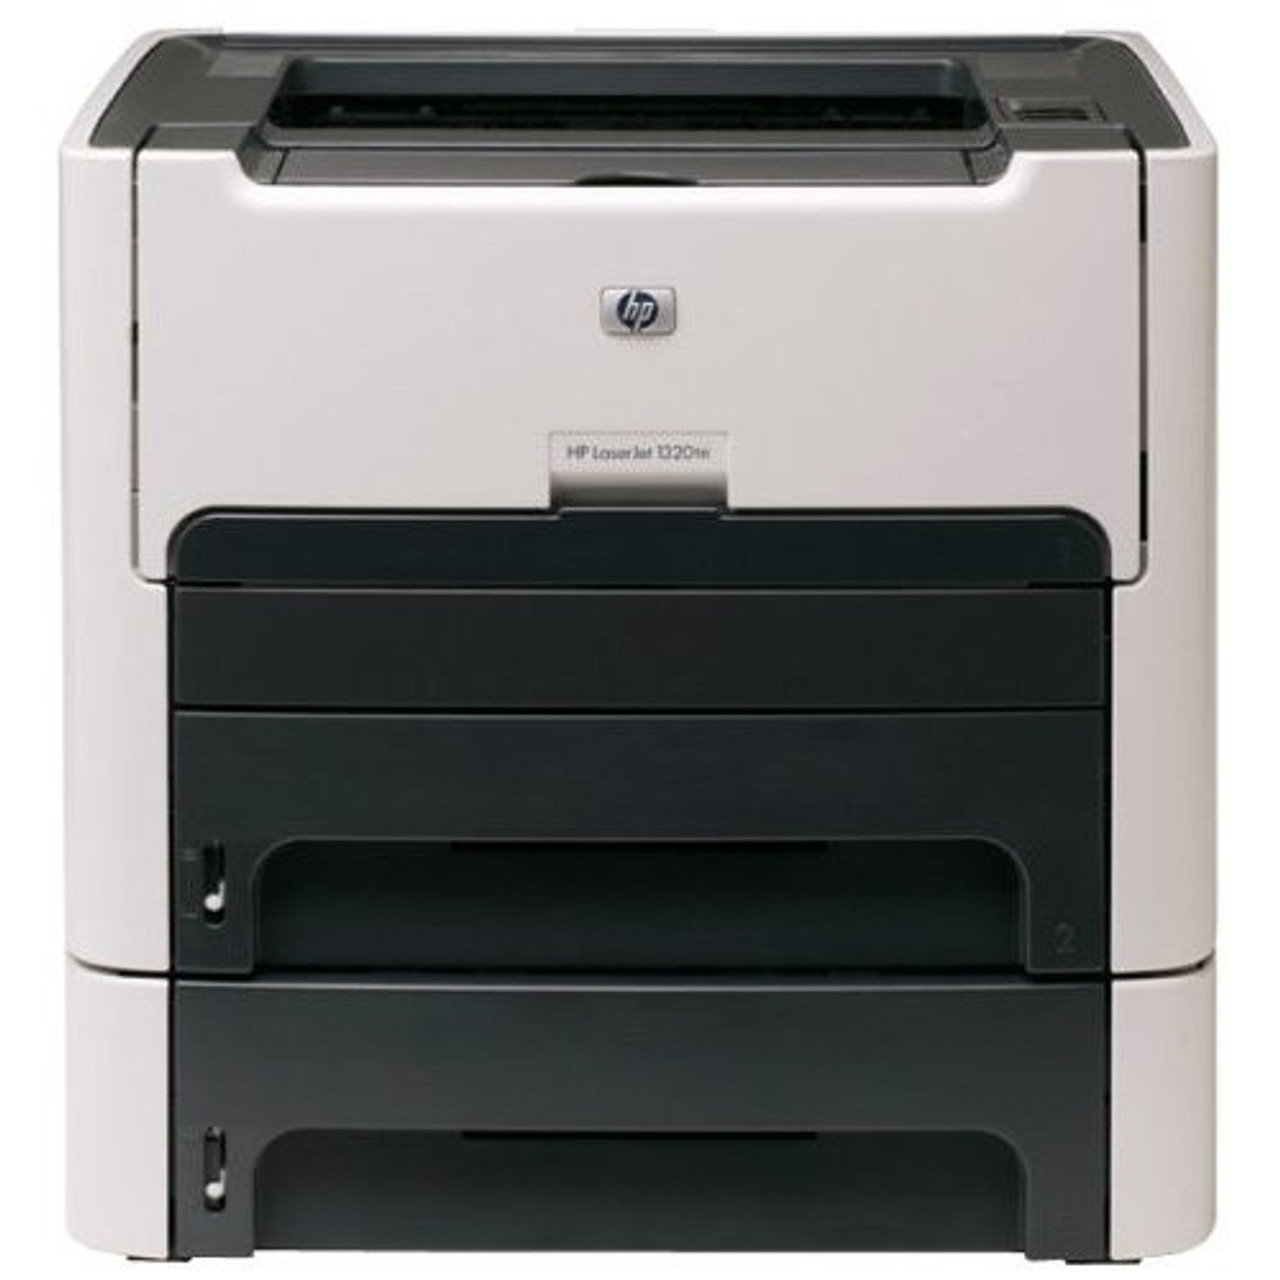 HP LaserJet 1320TN - Q5930A - HP Laser Printer for sale